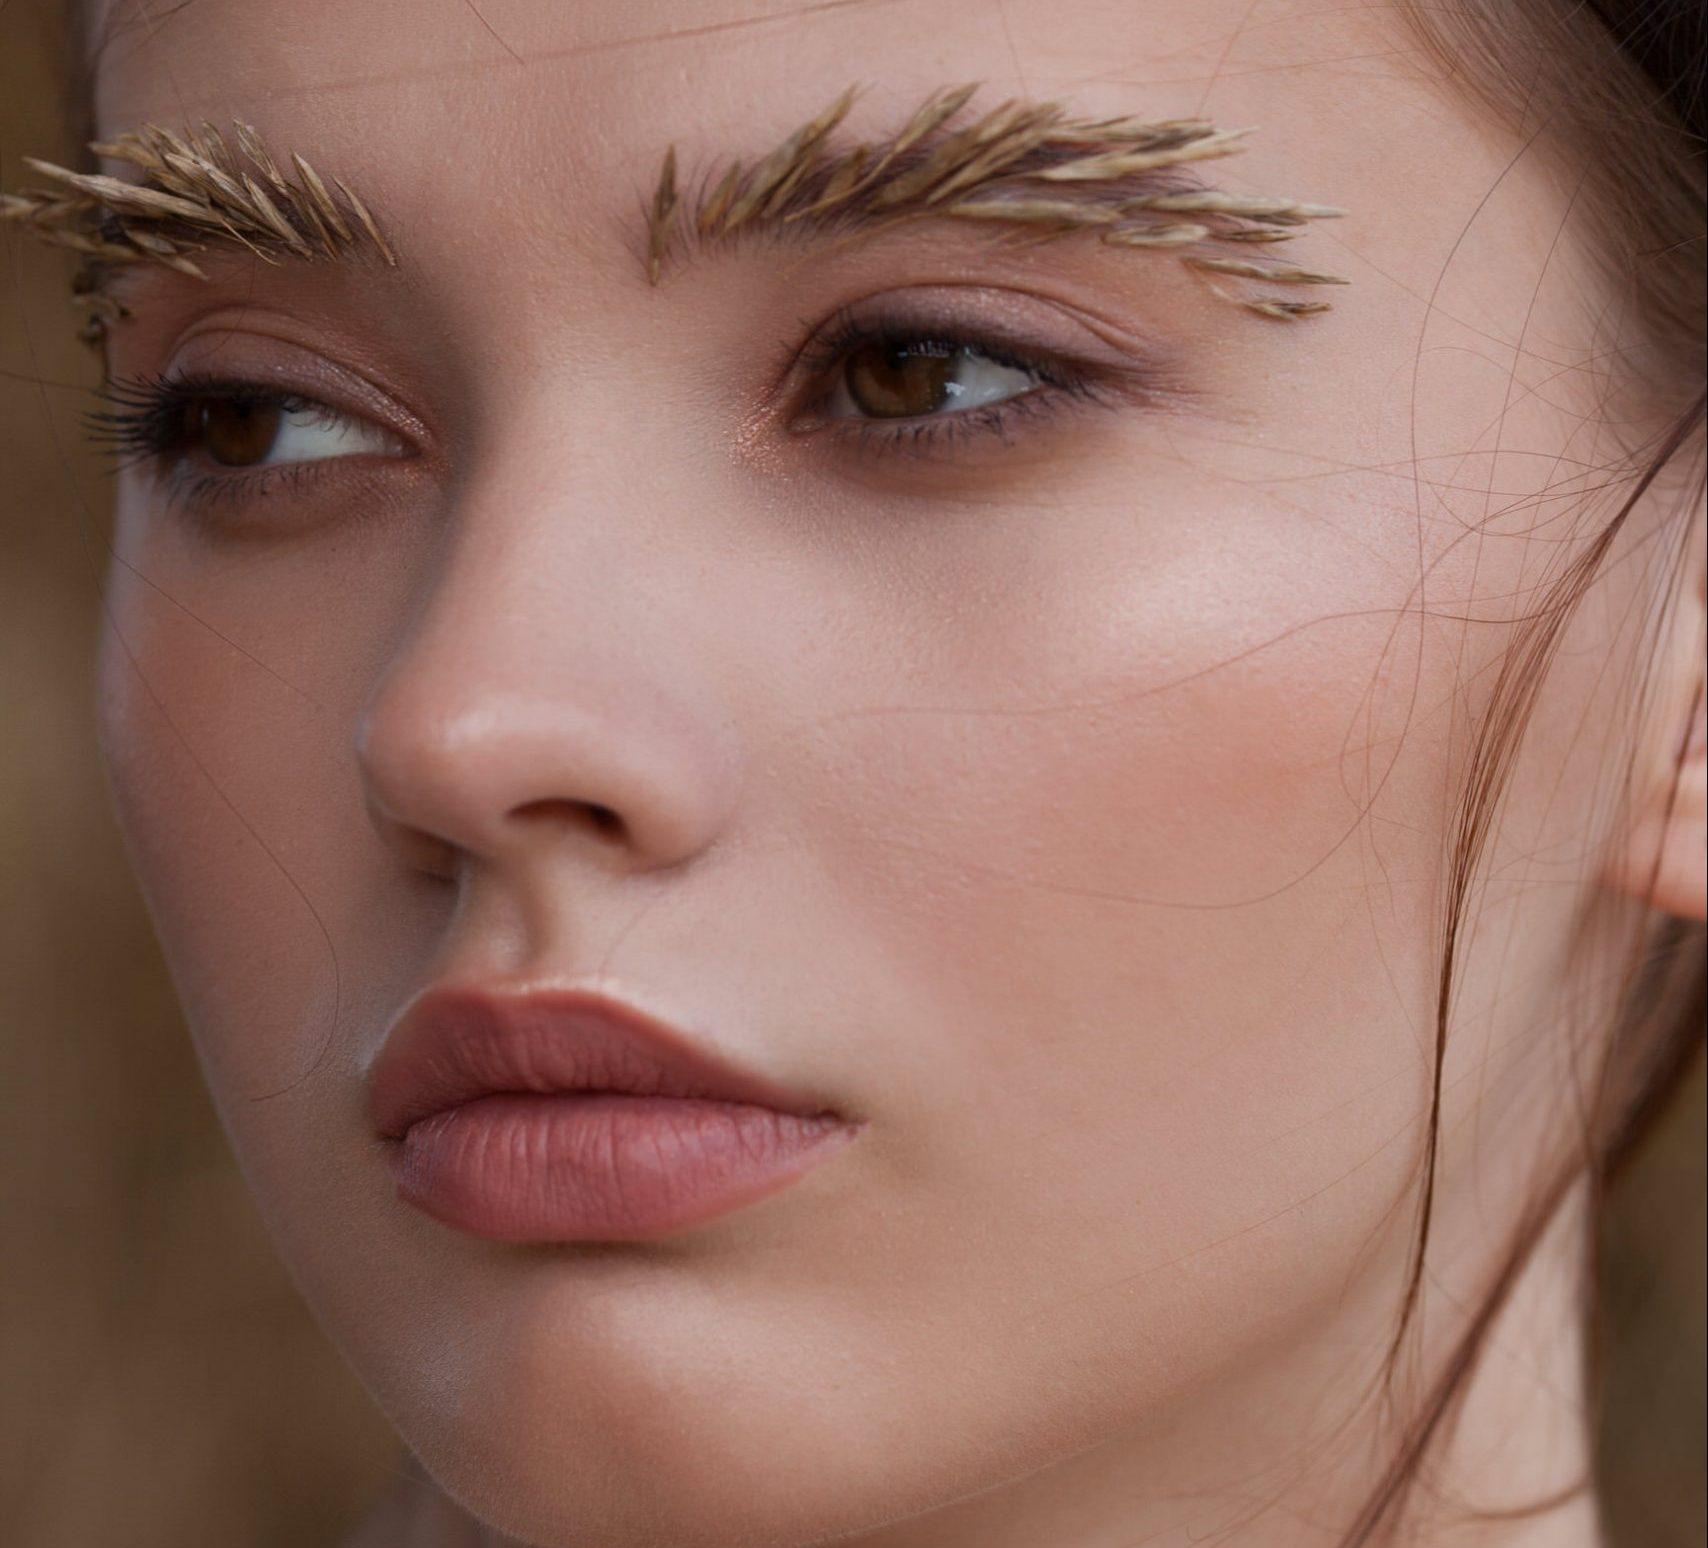 Whisper of reeds by Ekaterina Shitova Whisper of reeds by Ekaterina Shitova Vanity Teen Menswear & new faces magazine